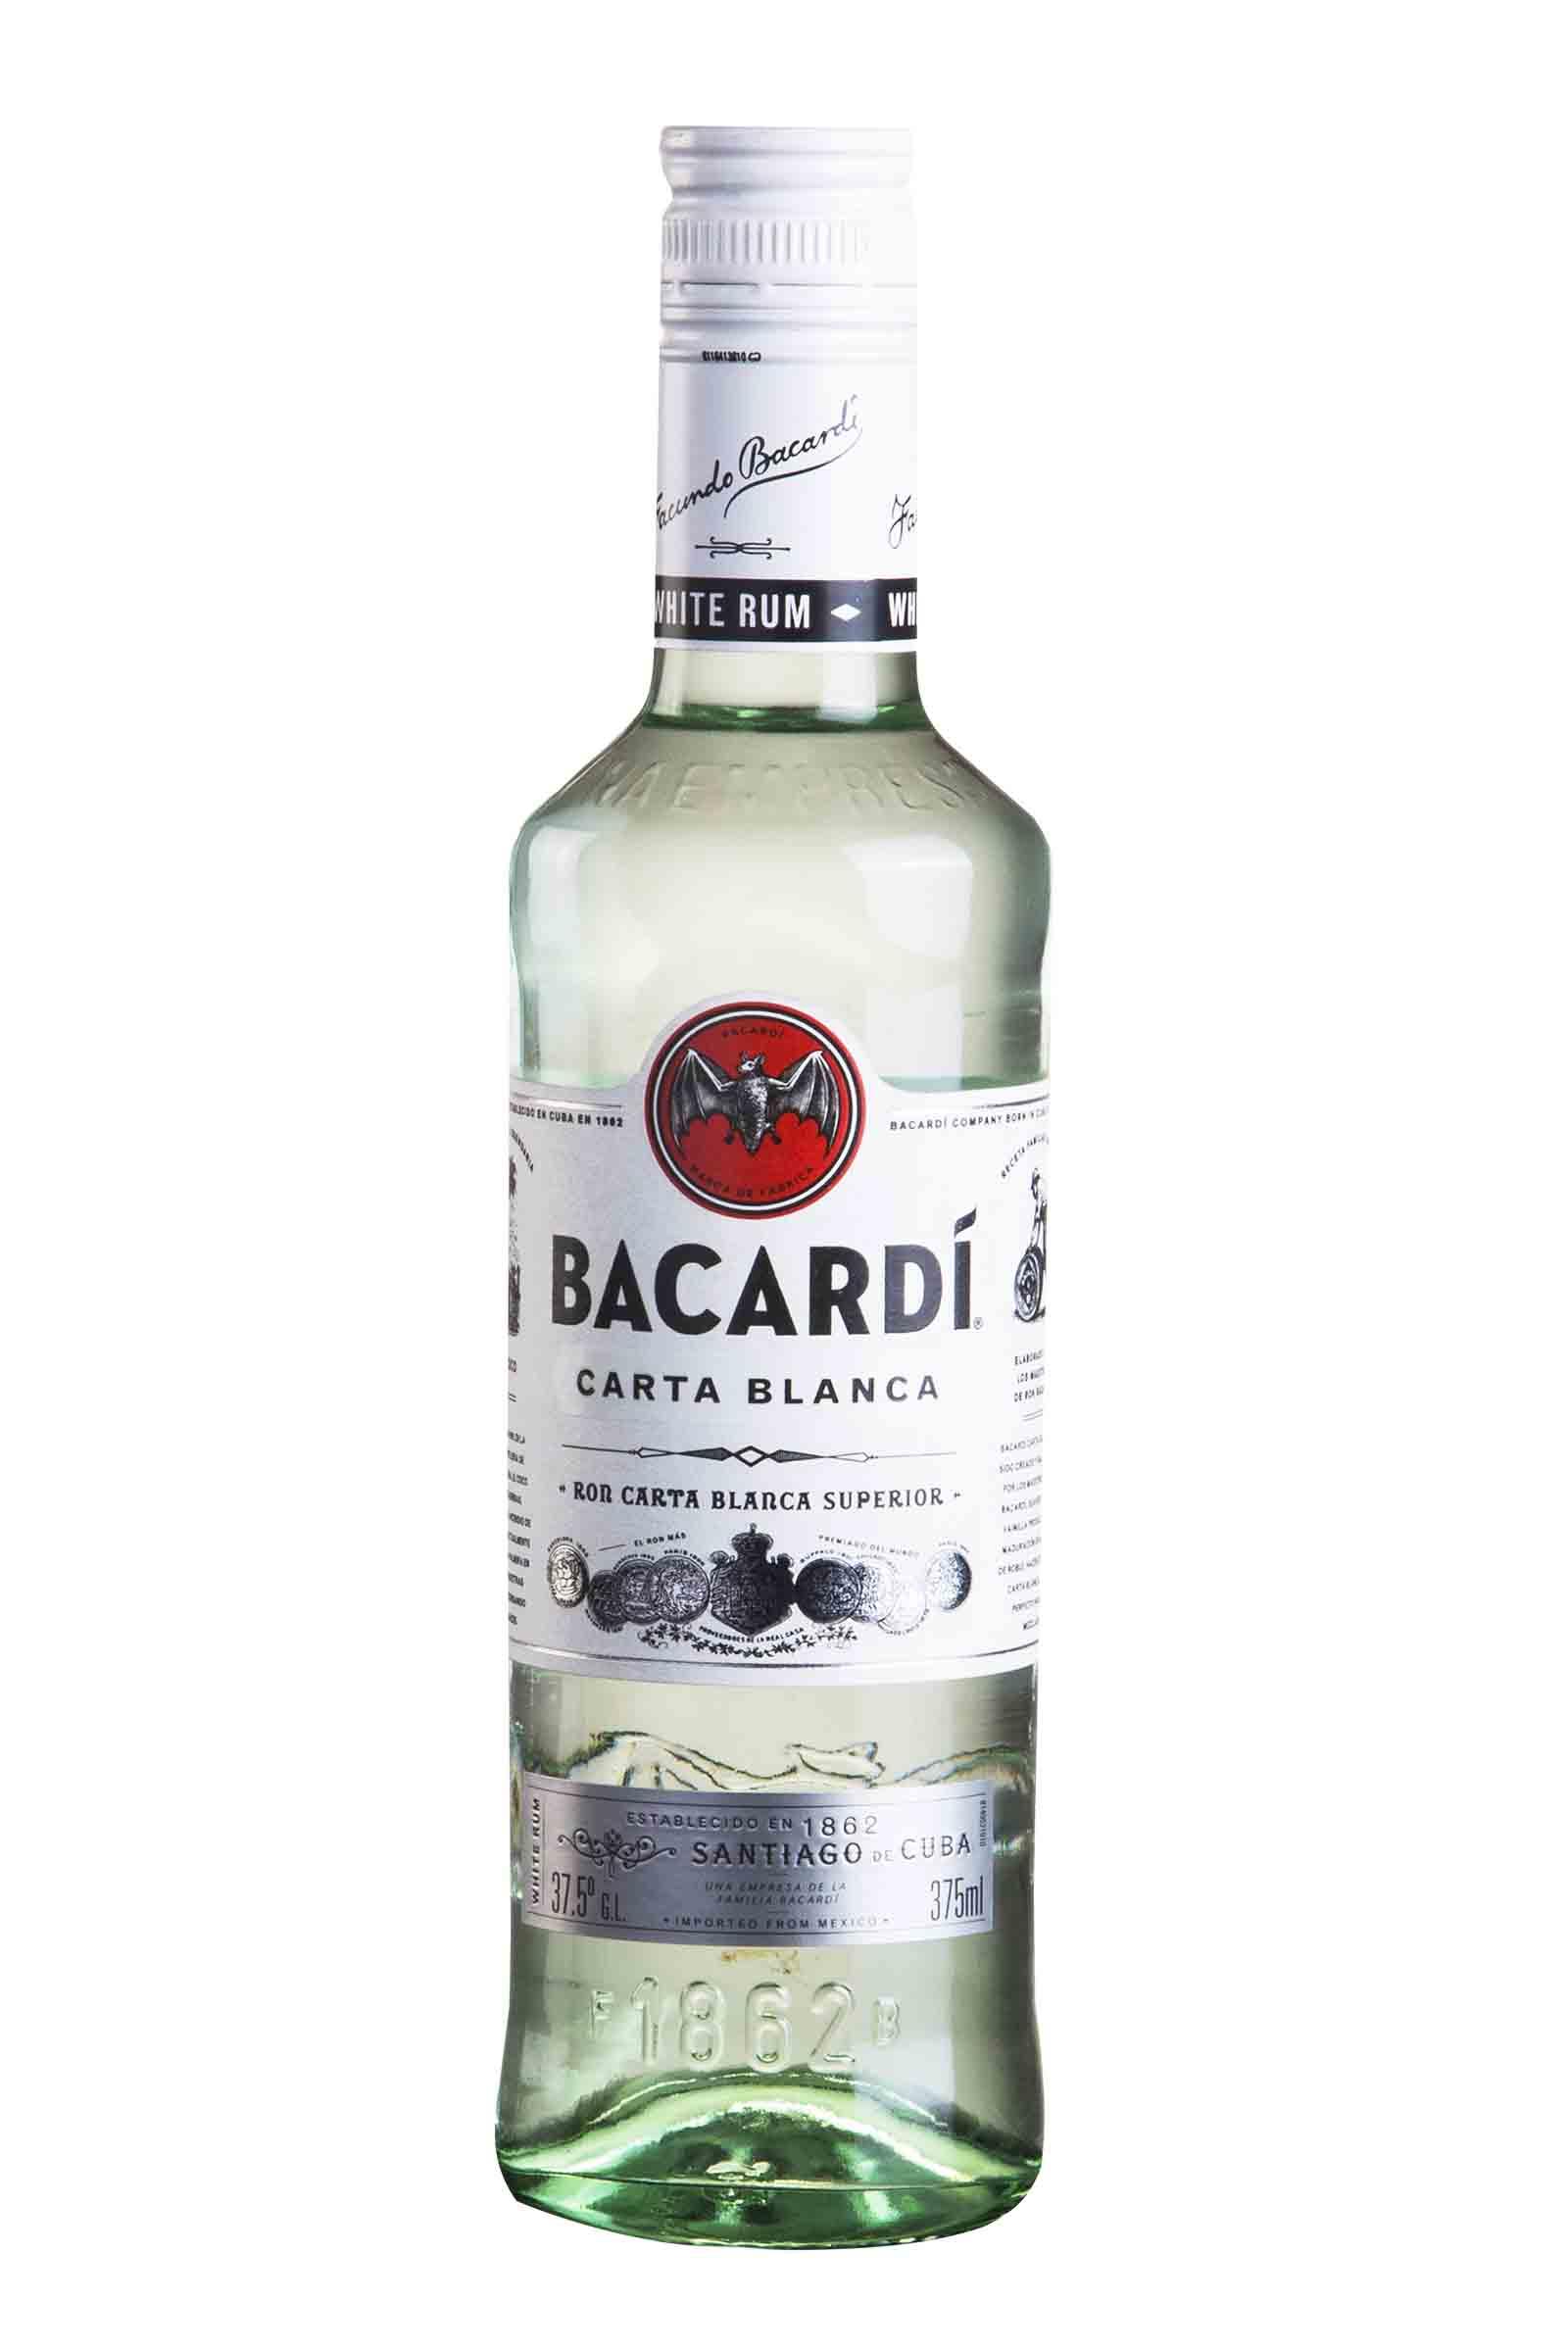 Ron Bacardi Carta Blanca 375ml